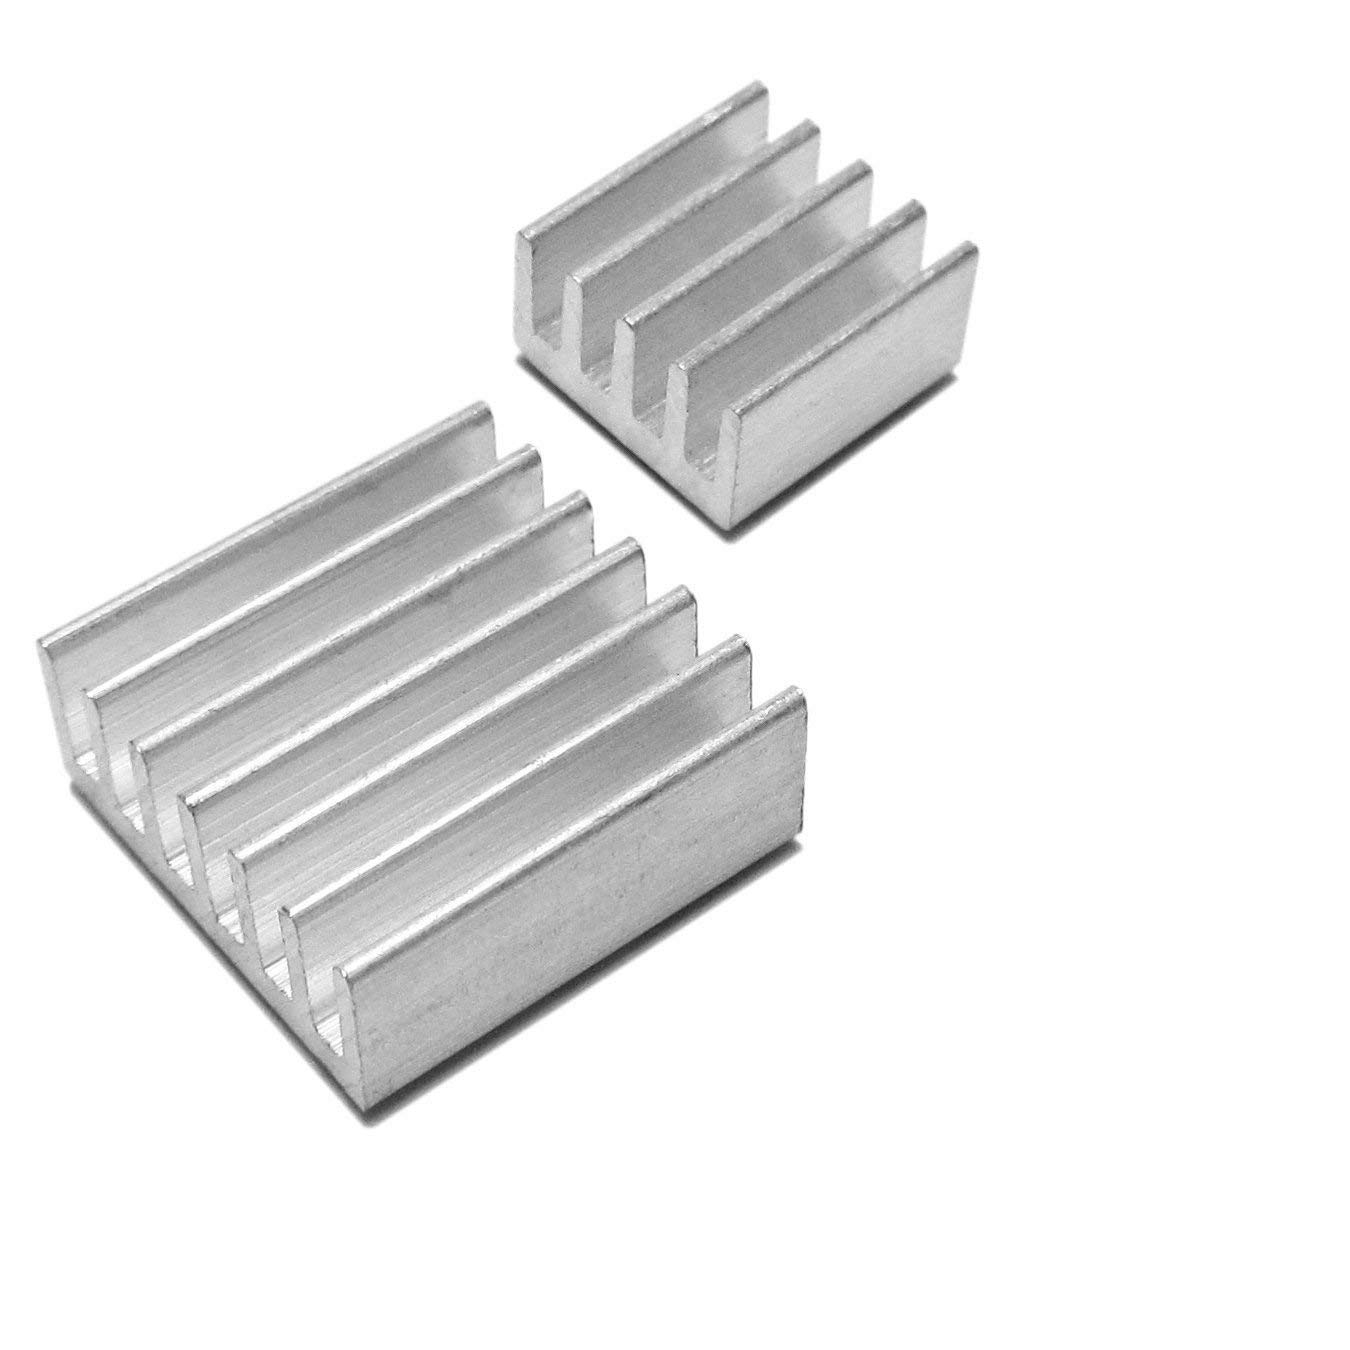 Mega1Comp -Raspberry Pi 3 Model B+ (B Plus), 16GB SD Card Noobs OS, 2X Aluminum Heatsink Kit [Latest Model 2019]